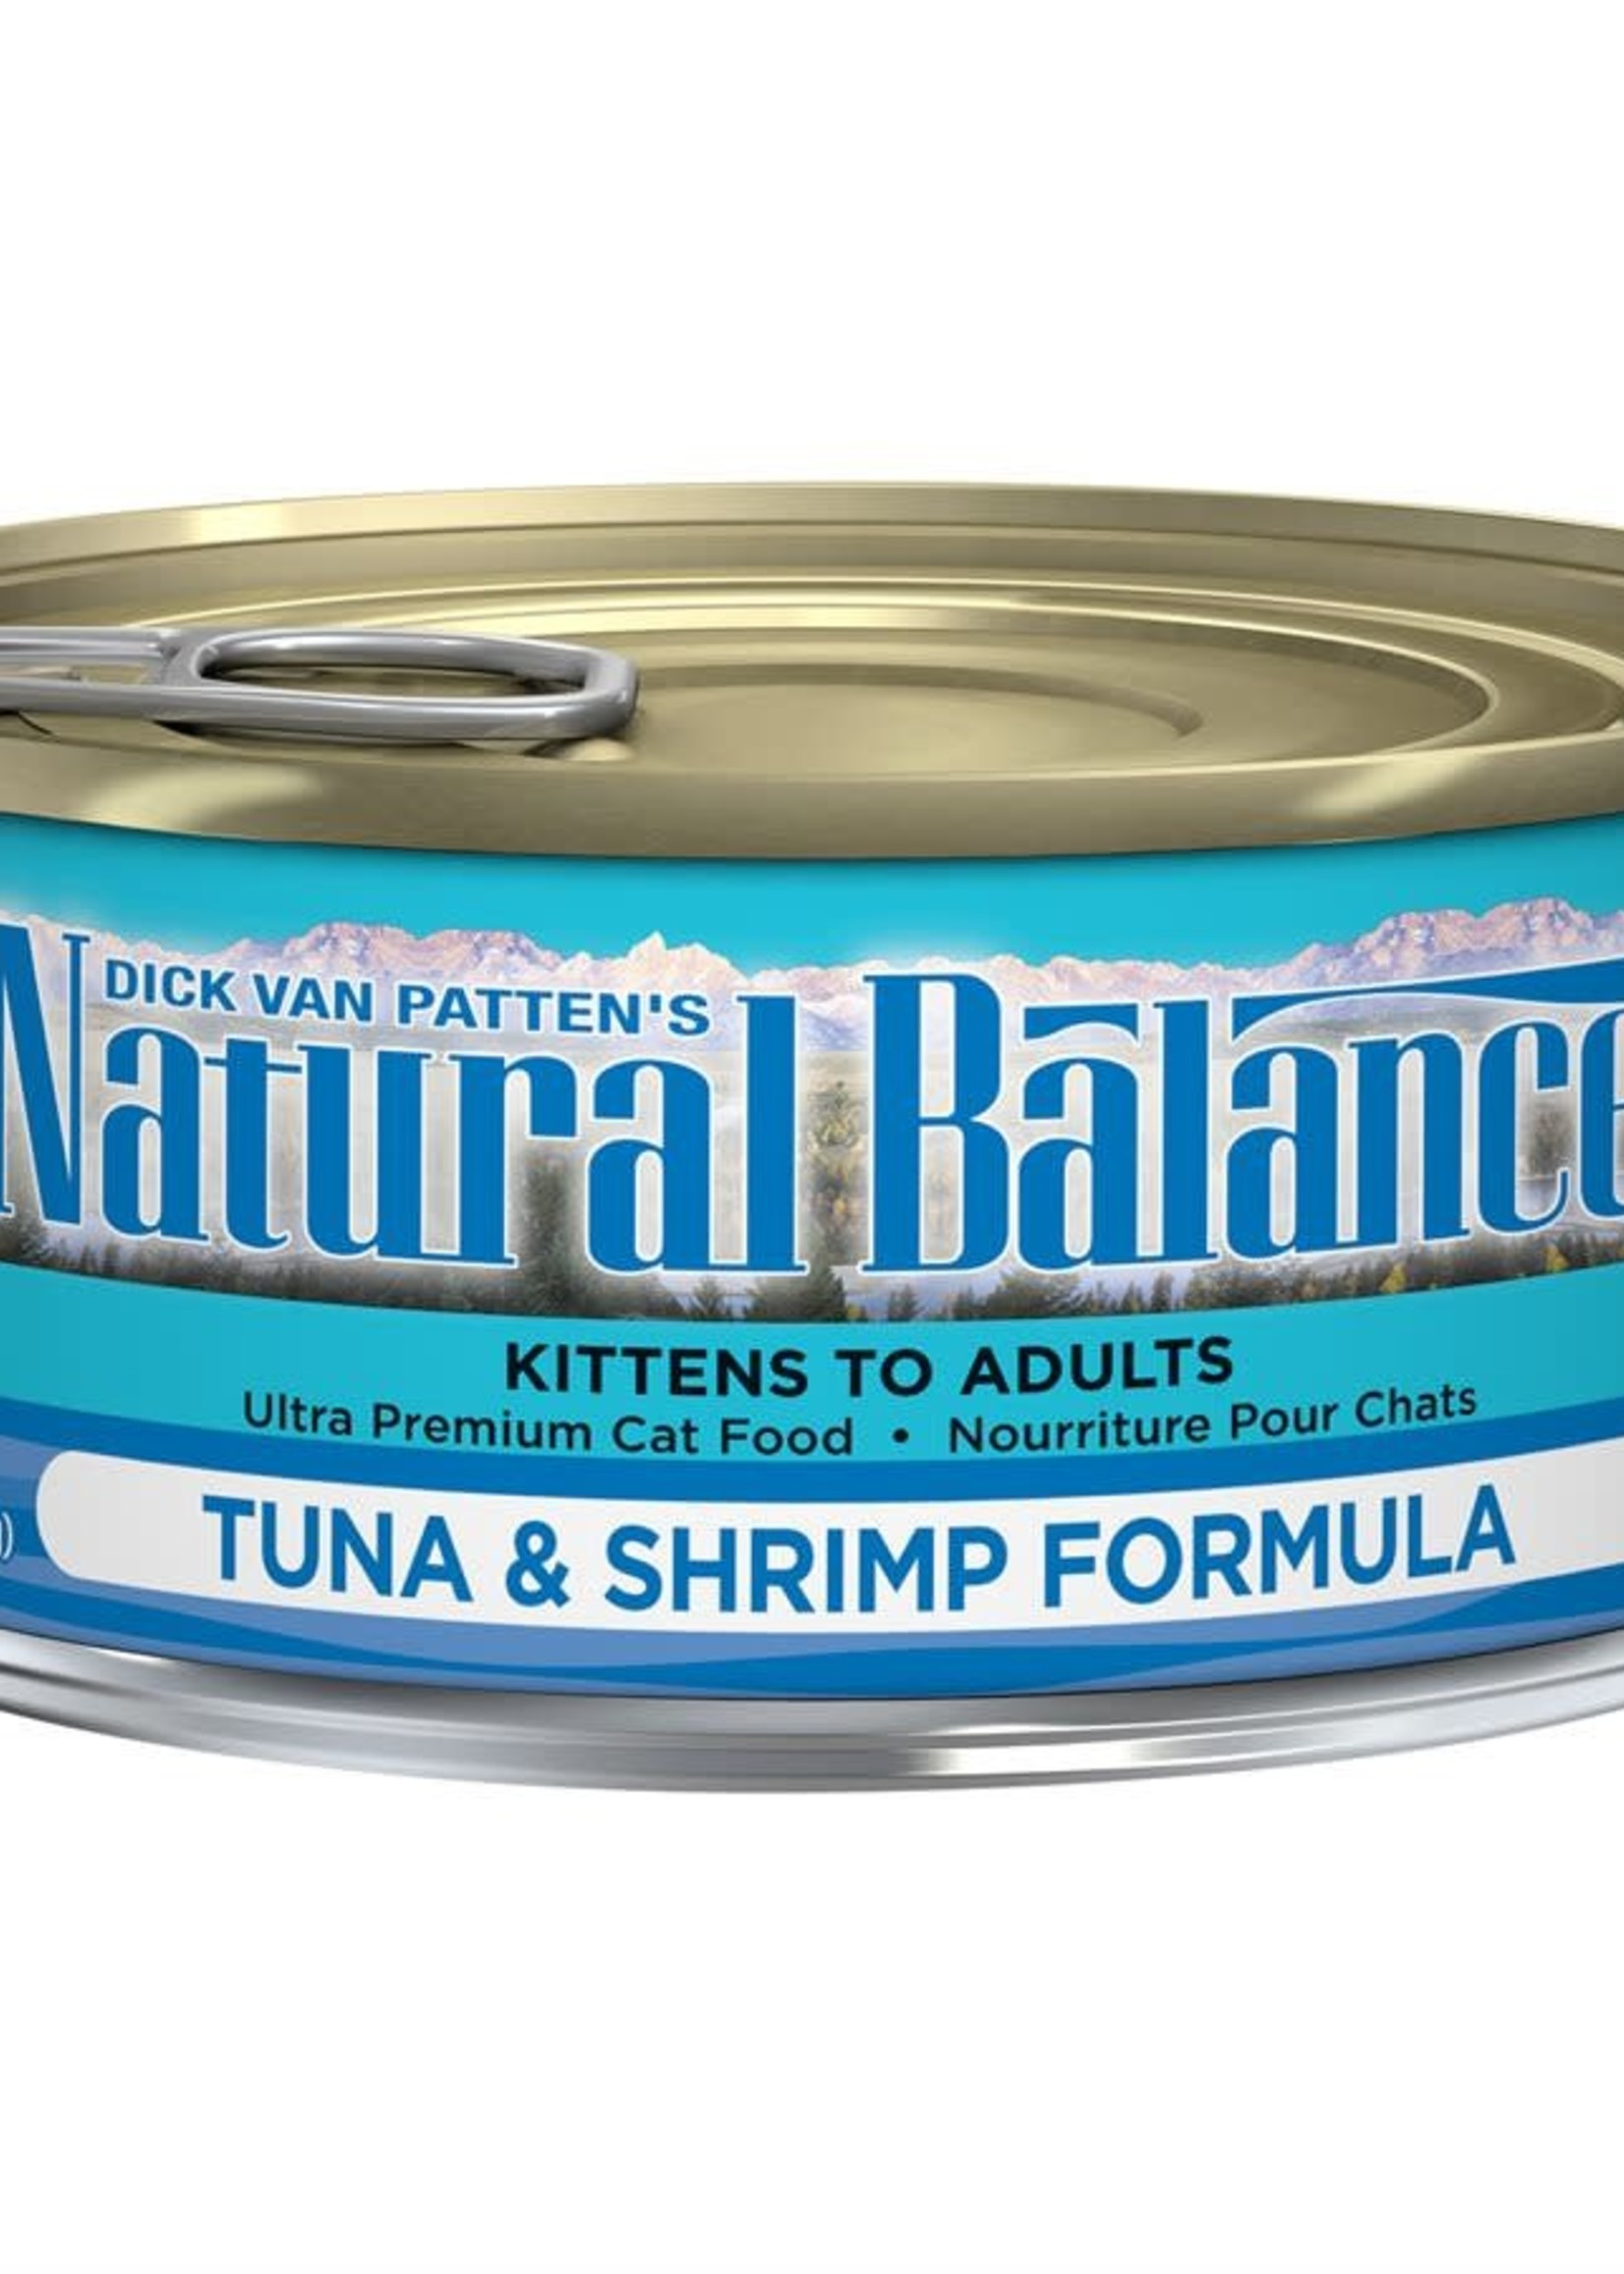 Natural Balance® NATURAL BALANCE TUNA & SHRIMP FORMULA 5.5oz